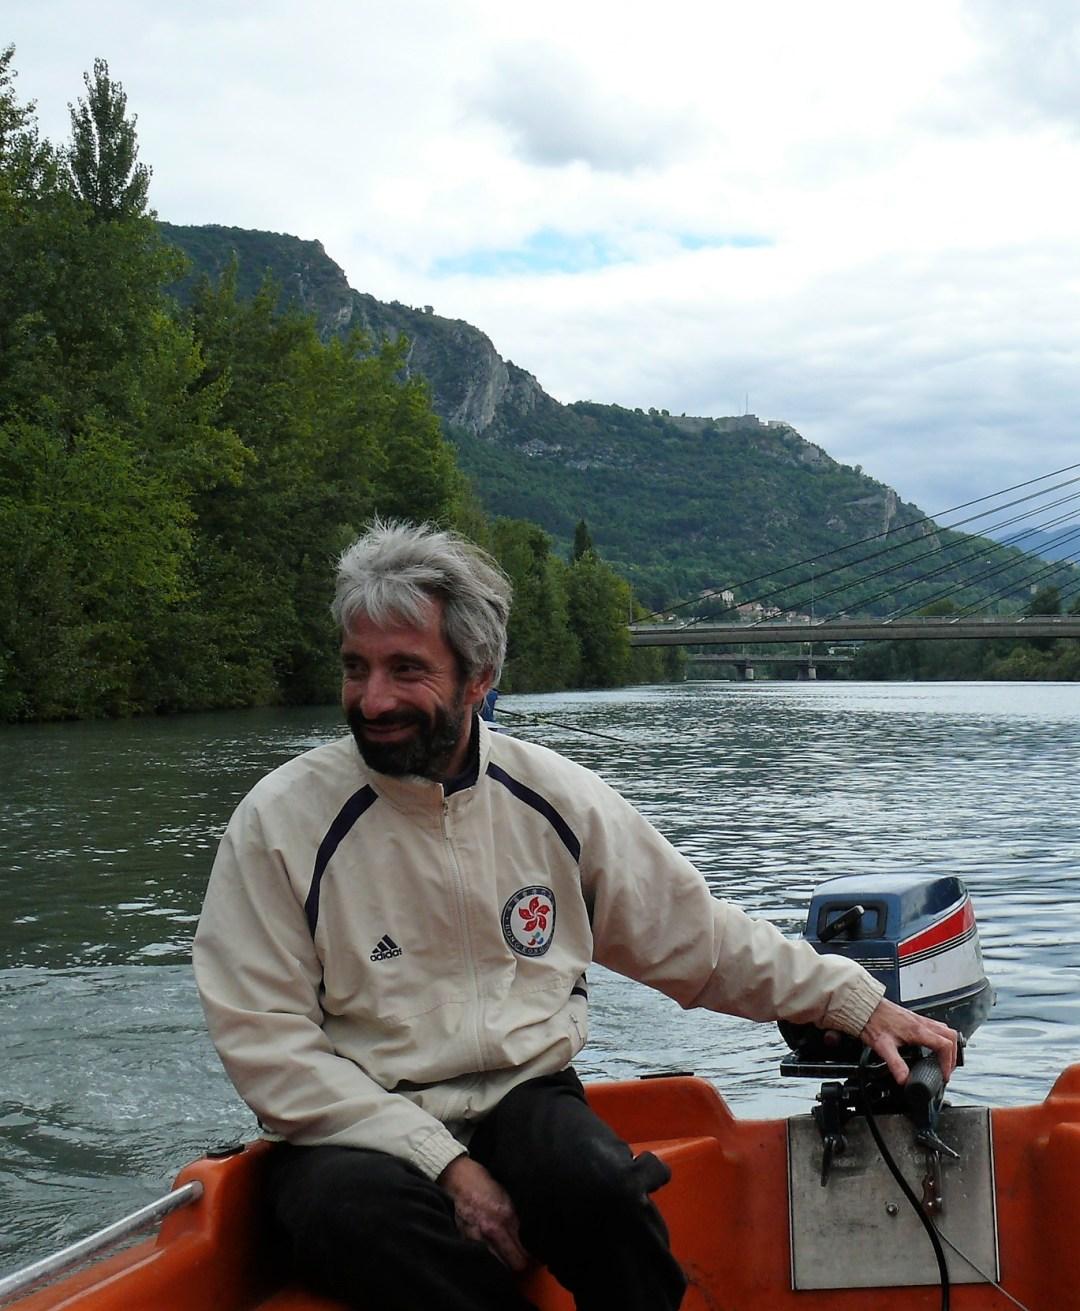 Christophe Giraudi